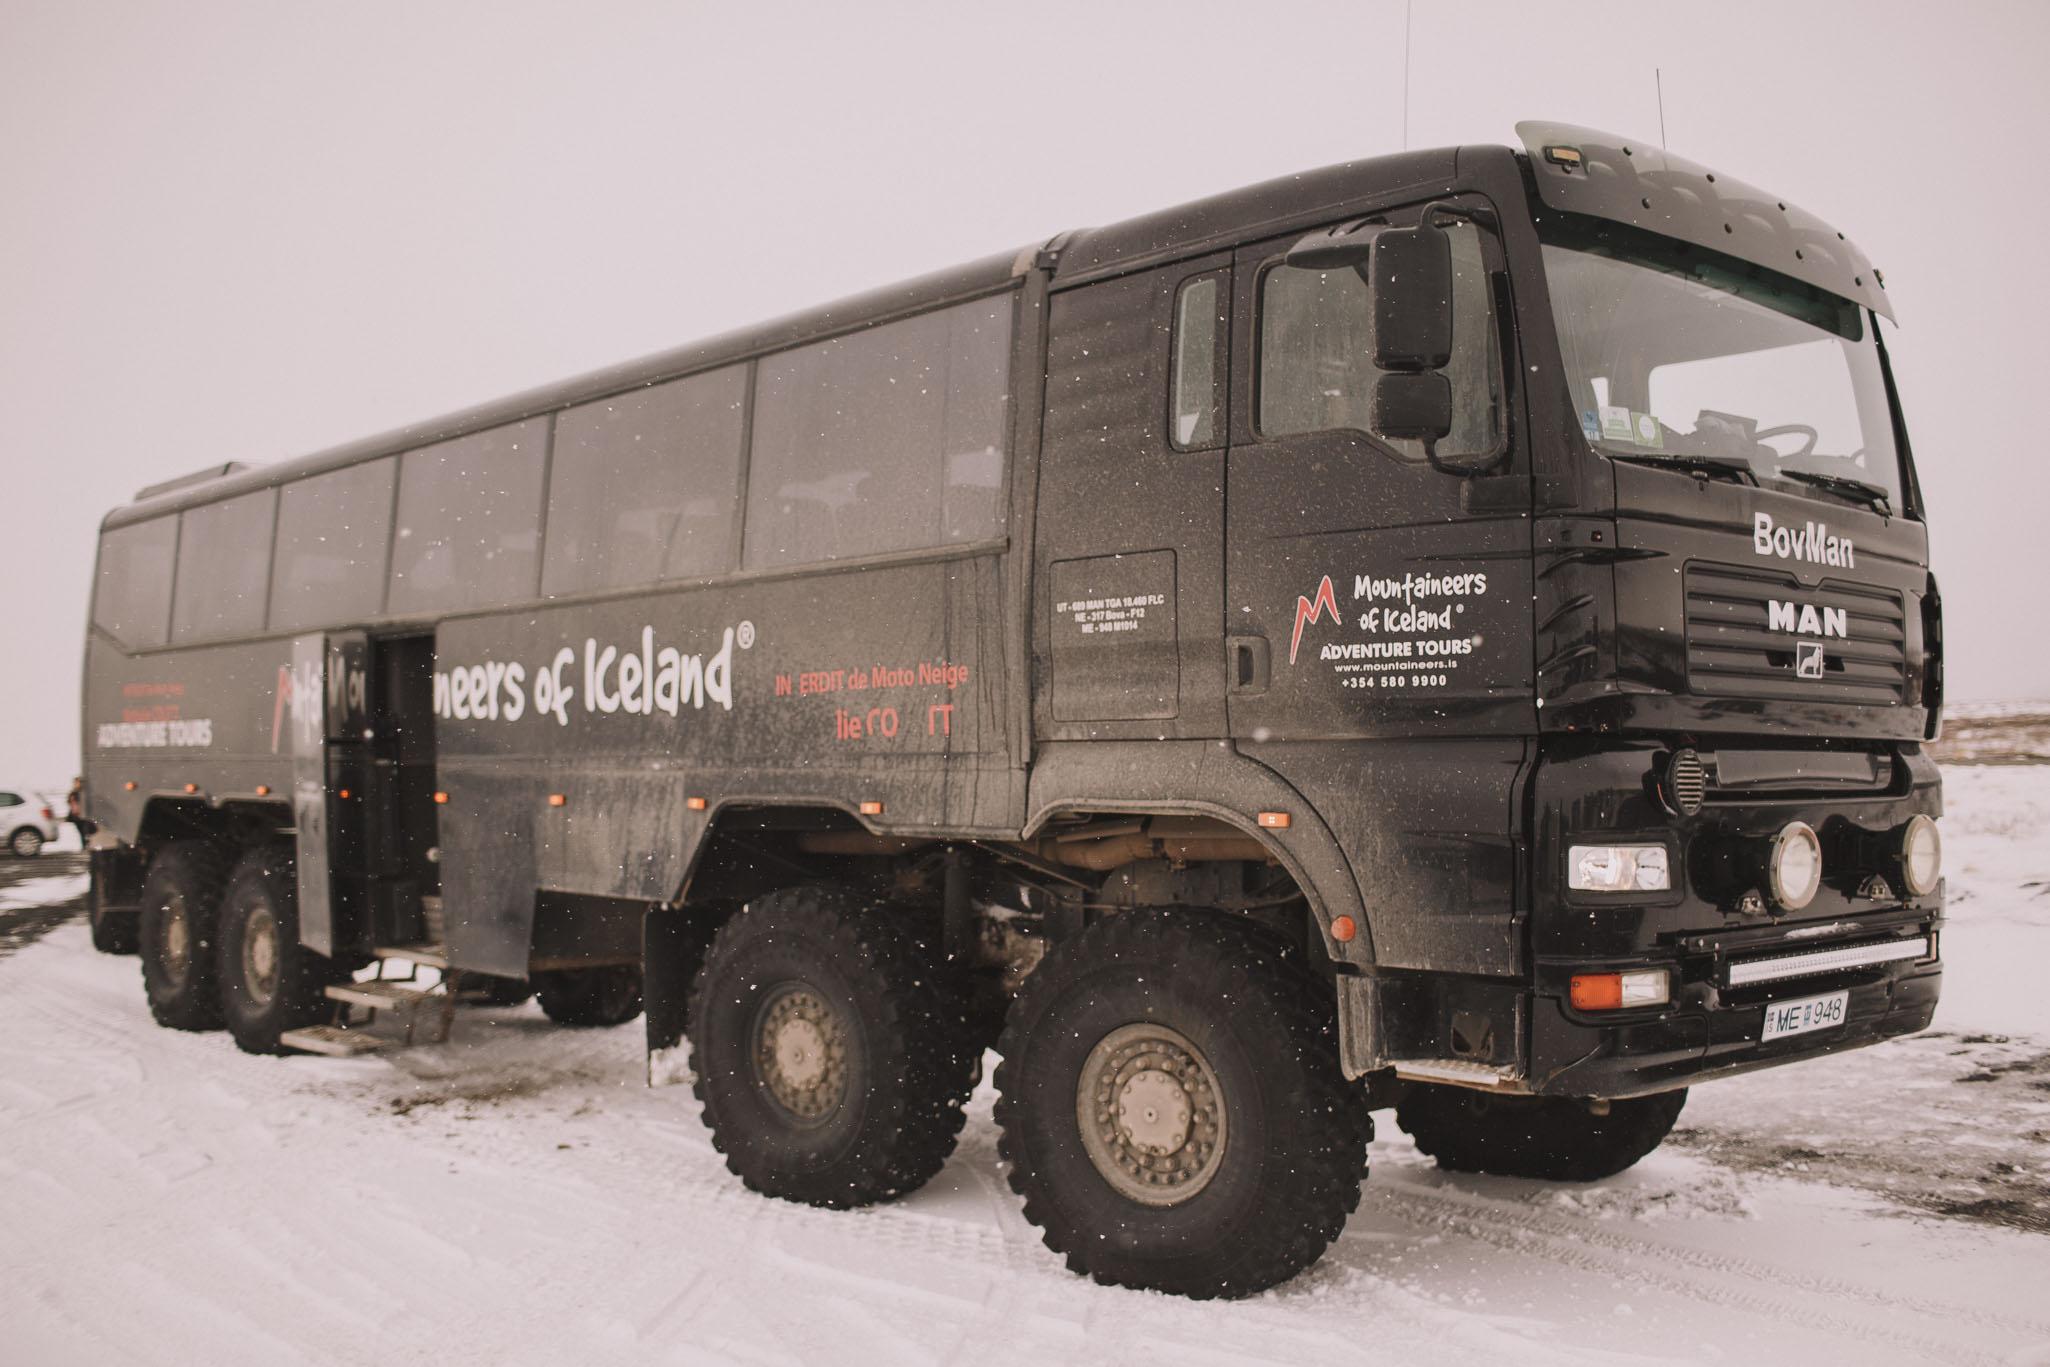 Road-trip-Islande-Iceland-Voyage-Travel-Portrait-Jérémy-Boyer-Geysir-Geysers-Horse-snow-ice-Gullfoss-7.jpg